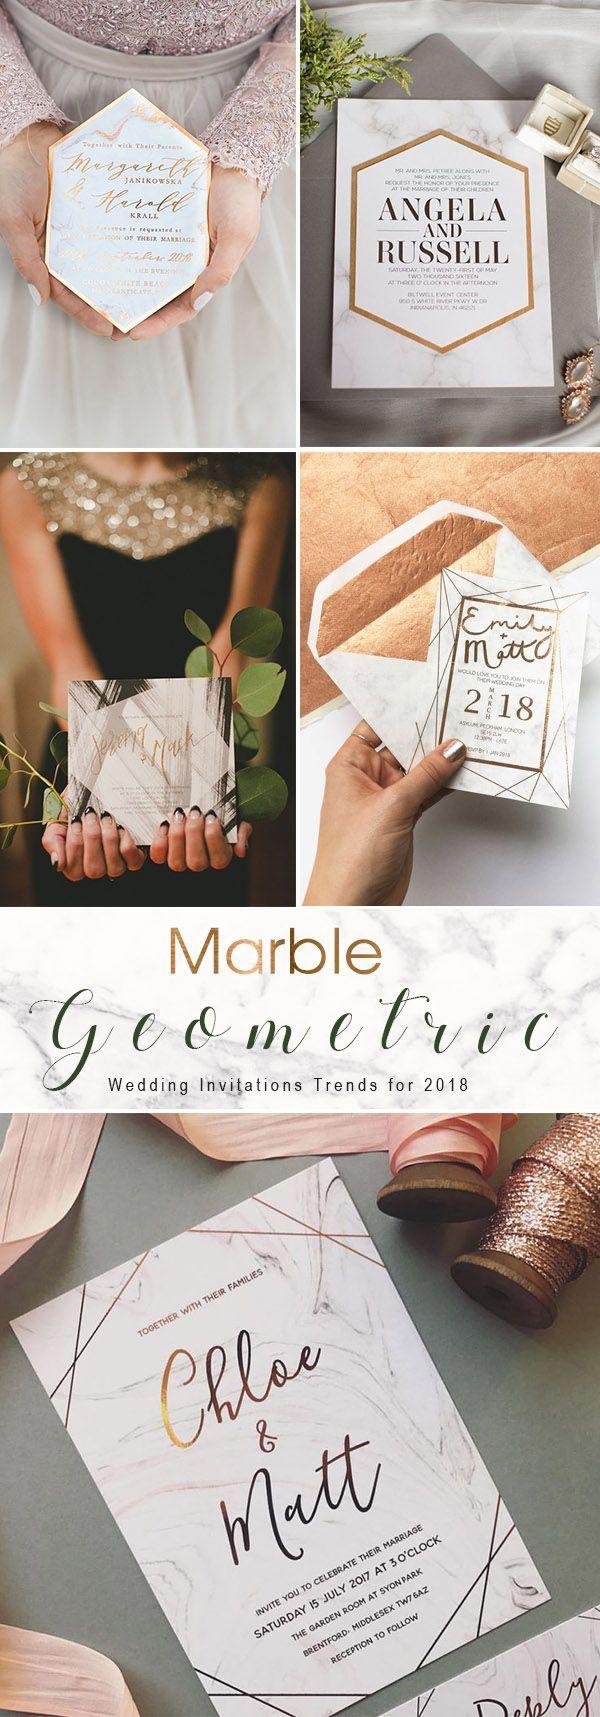 Marble inspired geometric modern wedding invitation ideas